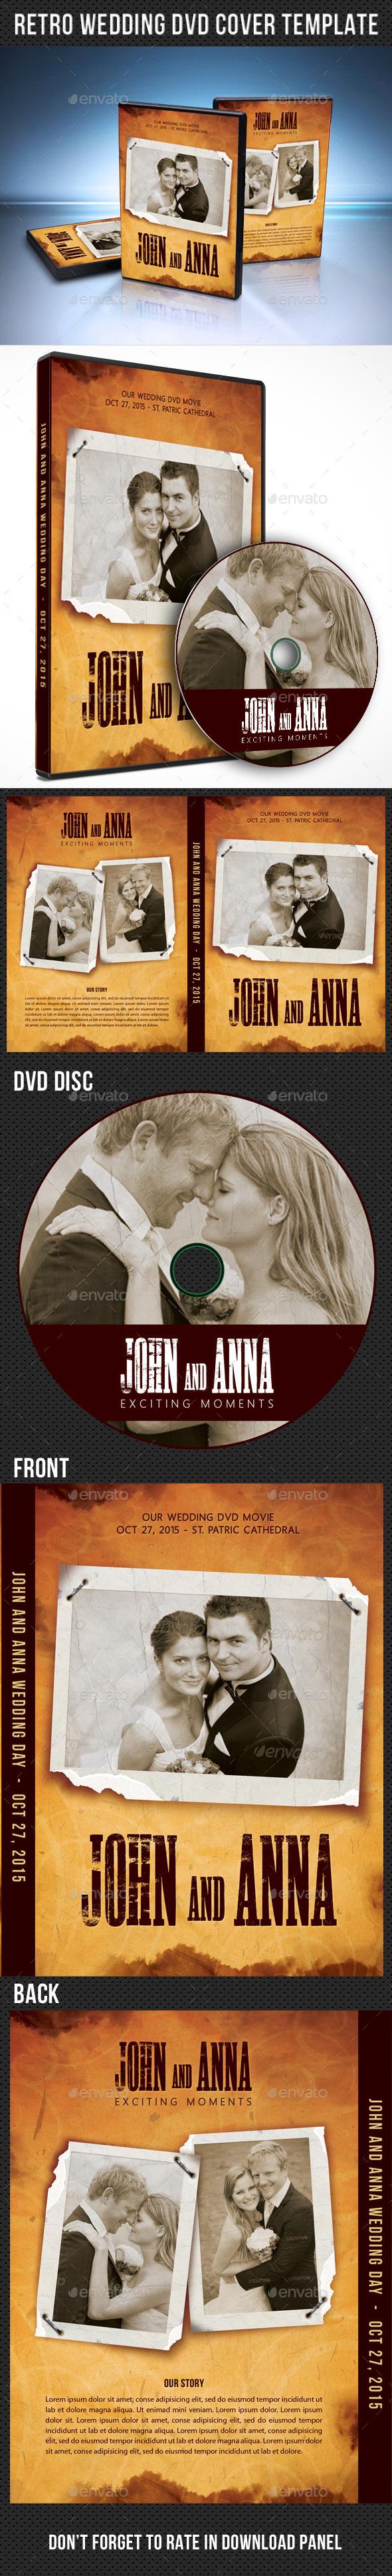 GraphicRiver Retro Wedding DVD Cover Template 04 9982286